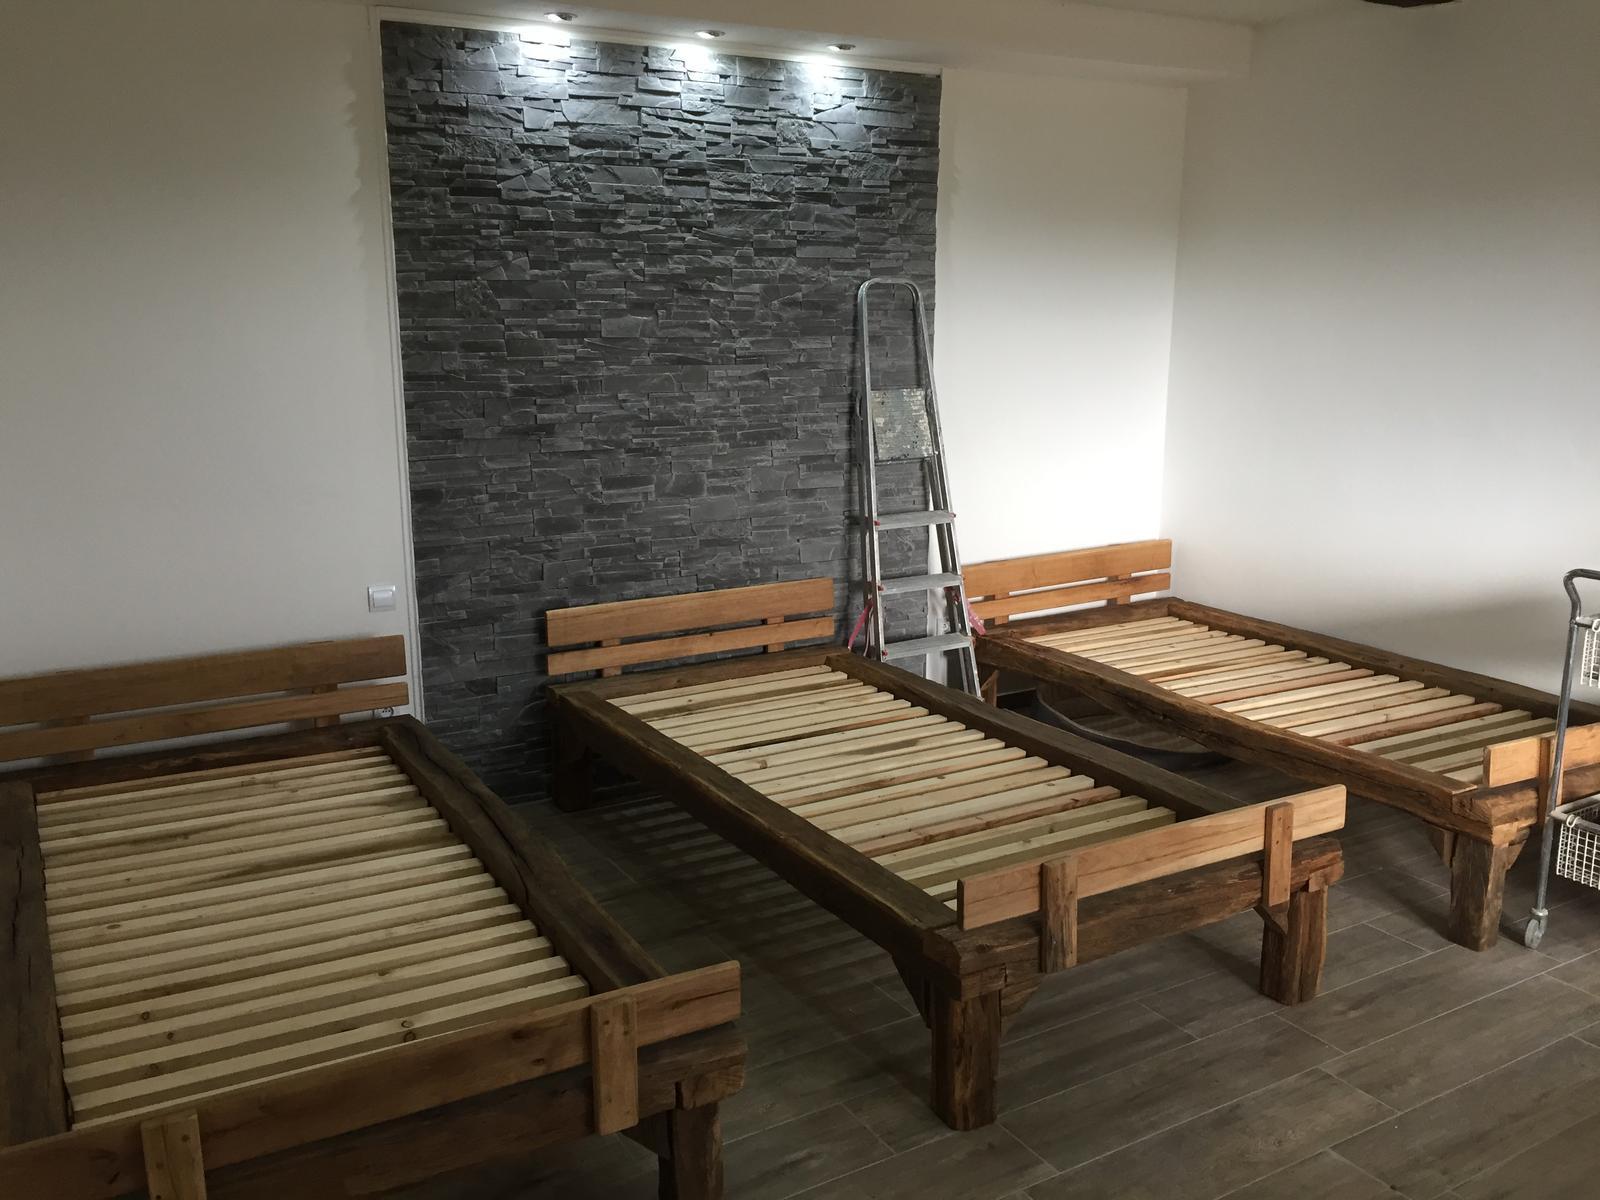 HACIENDA NAPOLI SEBECHLEBY - Prve postele na mieste :)